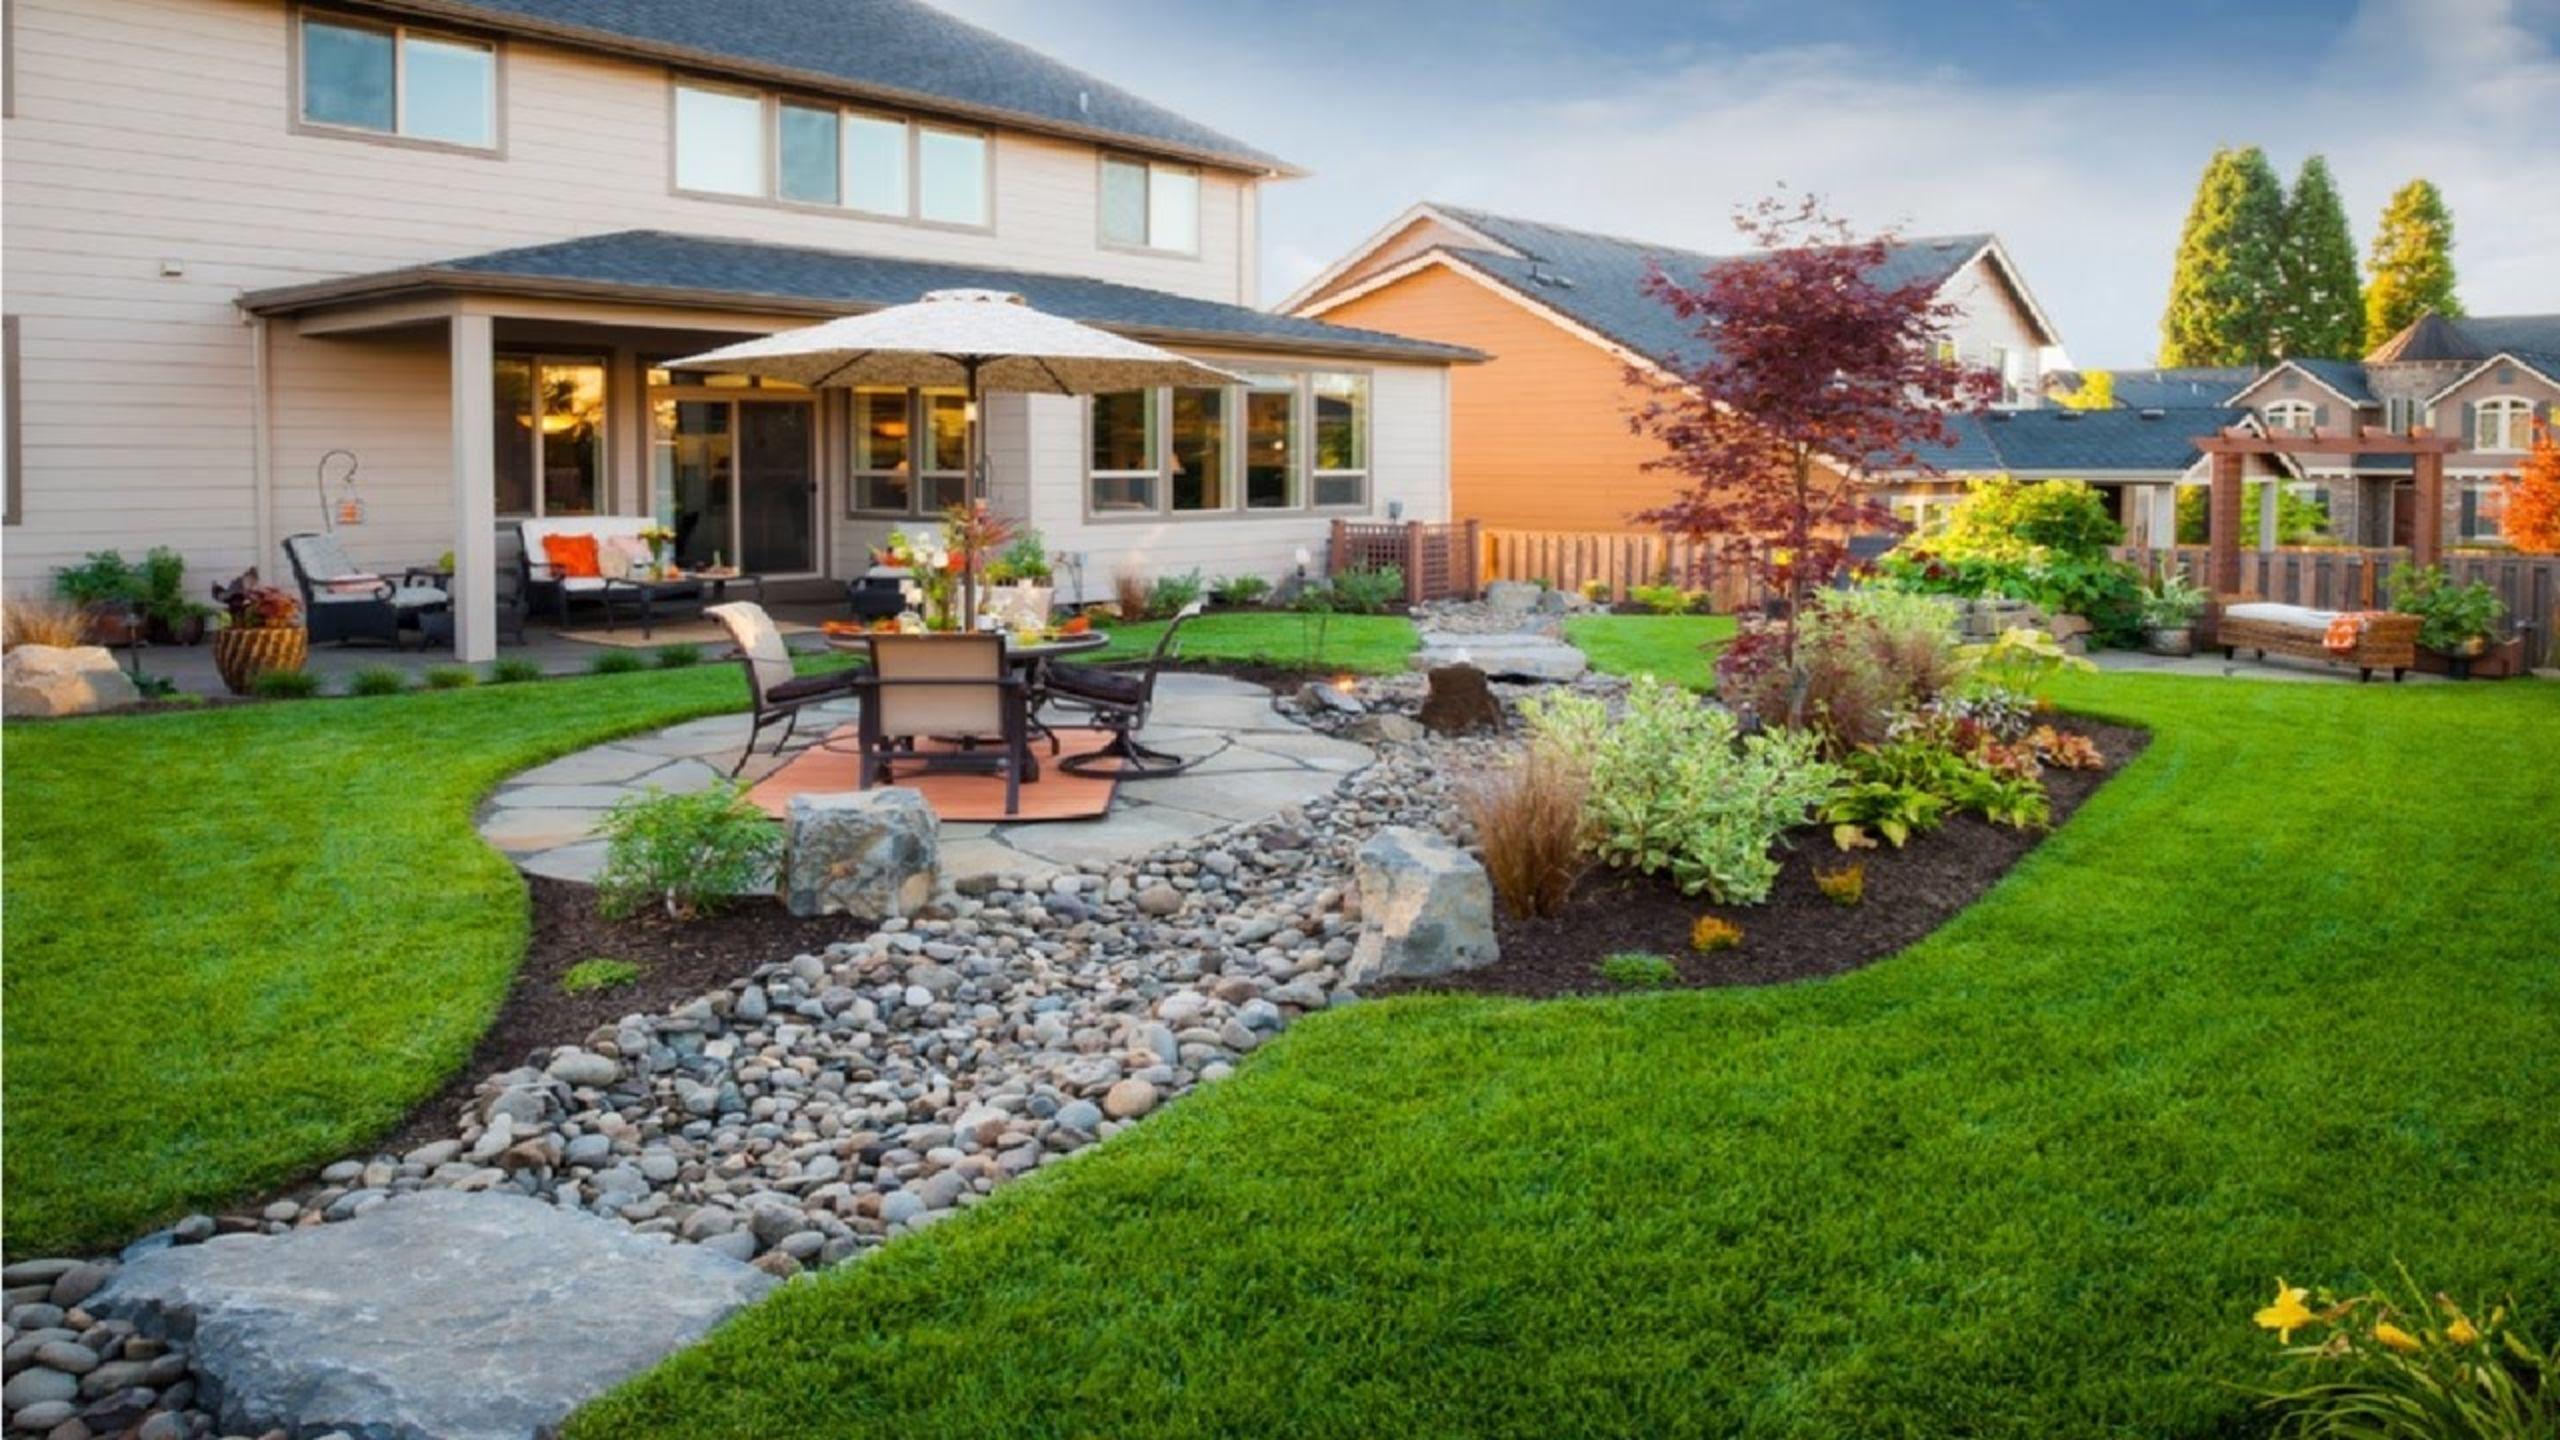 lawn-garden..-2 100+ Surprising Garden Design Ideas You Should Not Miss in 2021